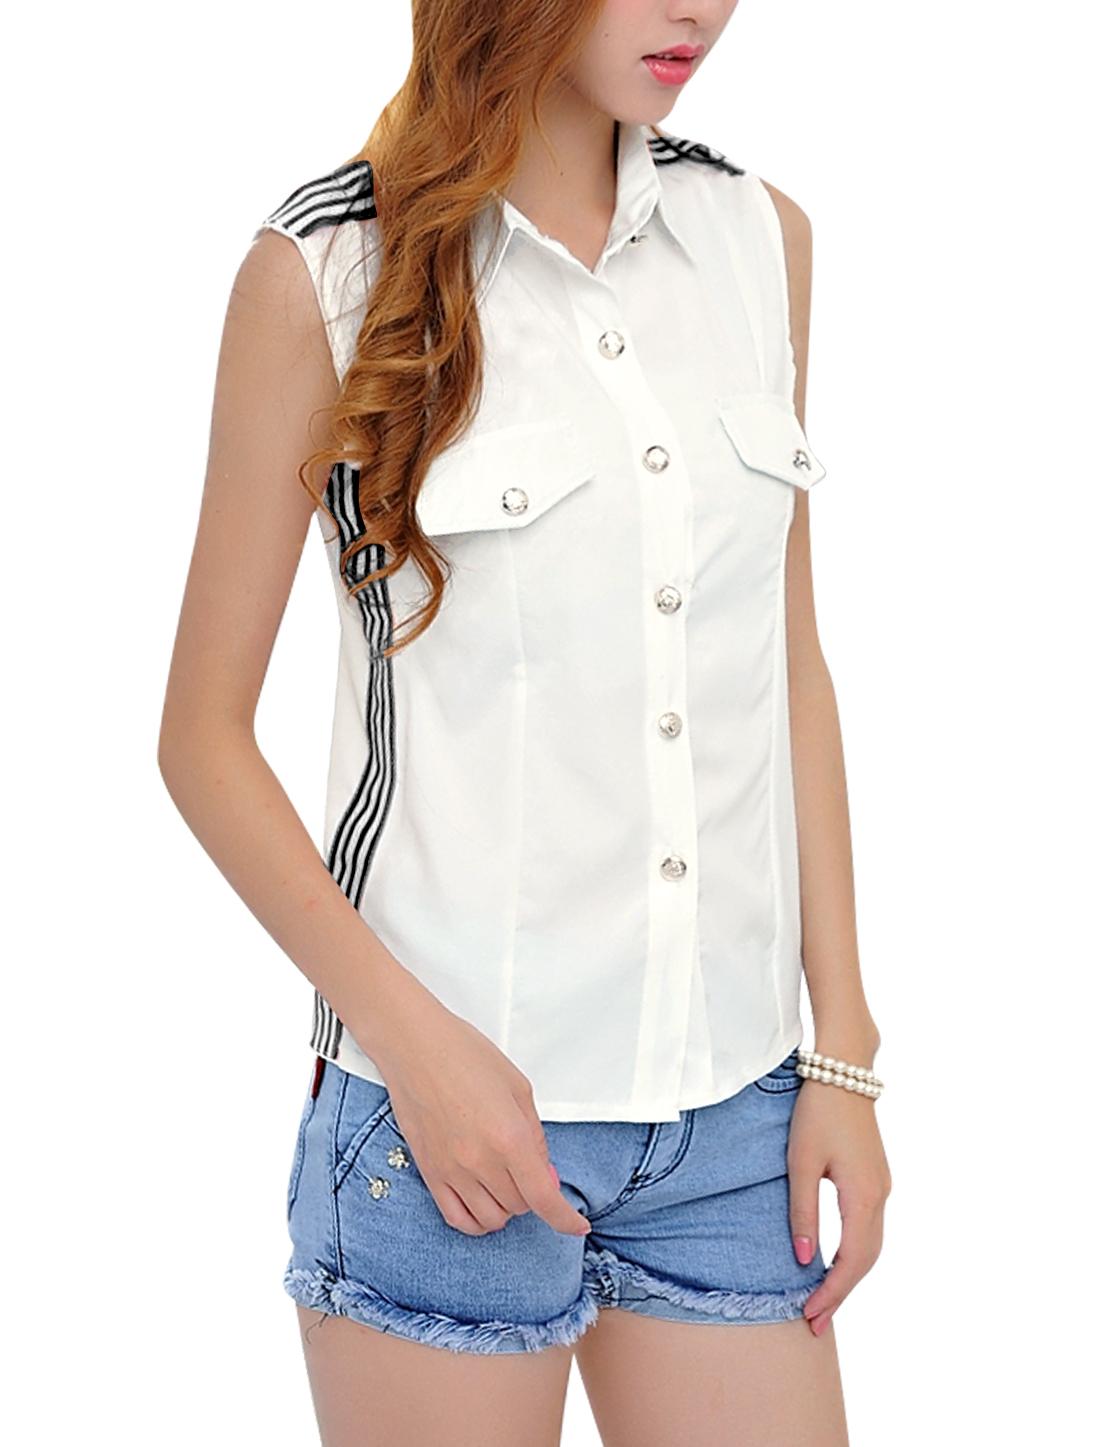 Women Point Collar Mock Pockets Fashion Tank Top Black White S